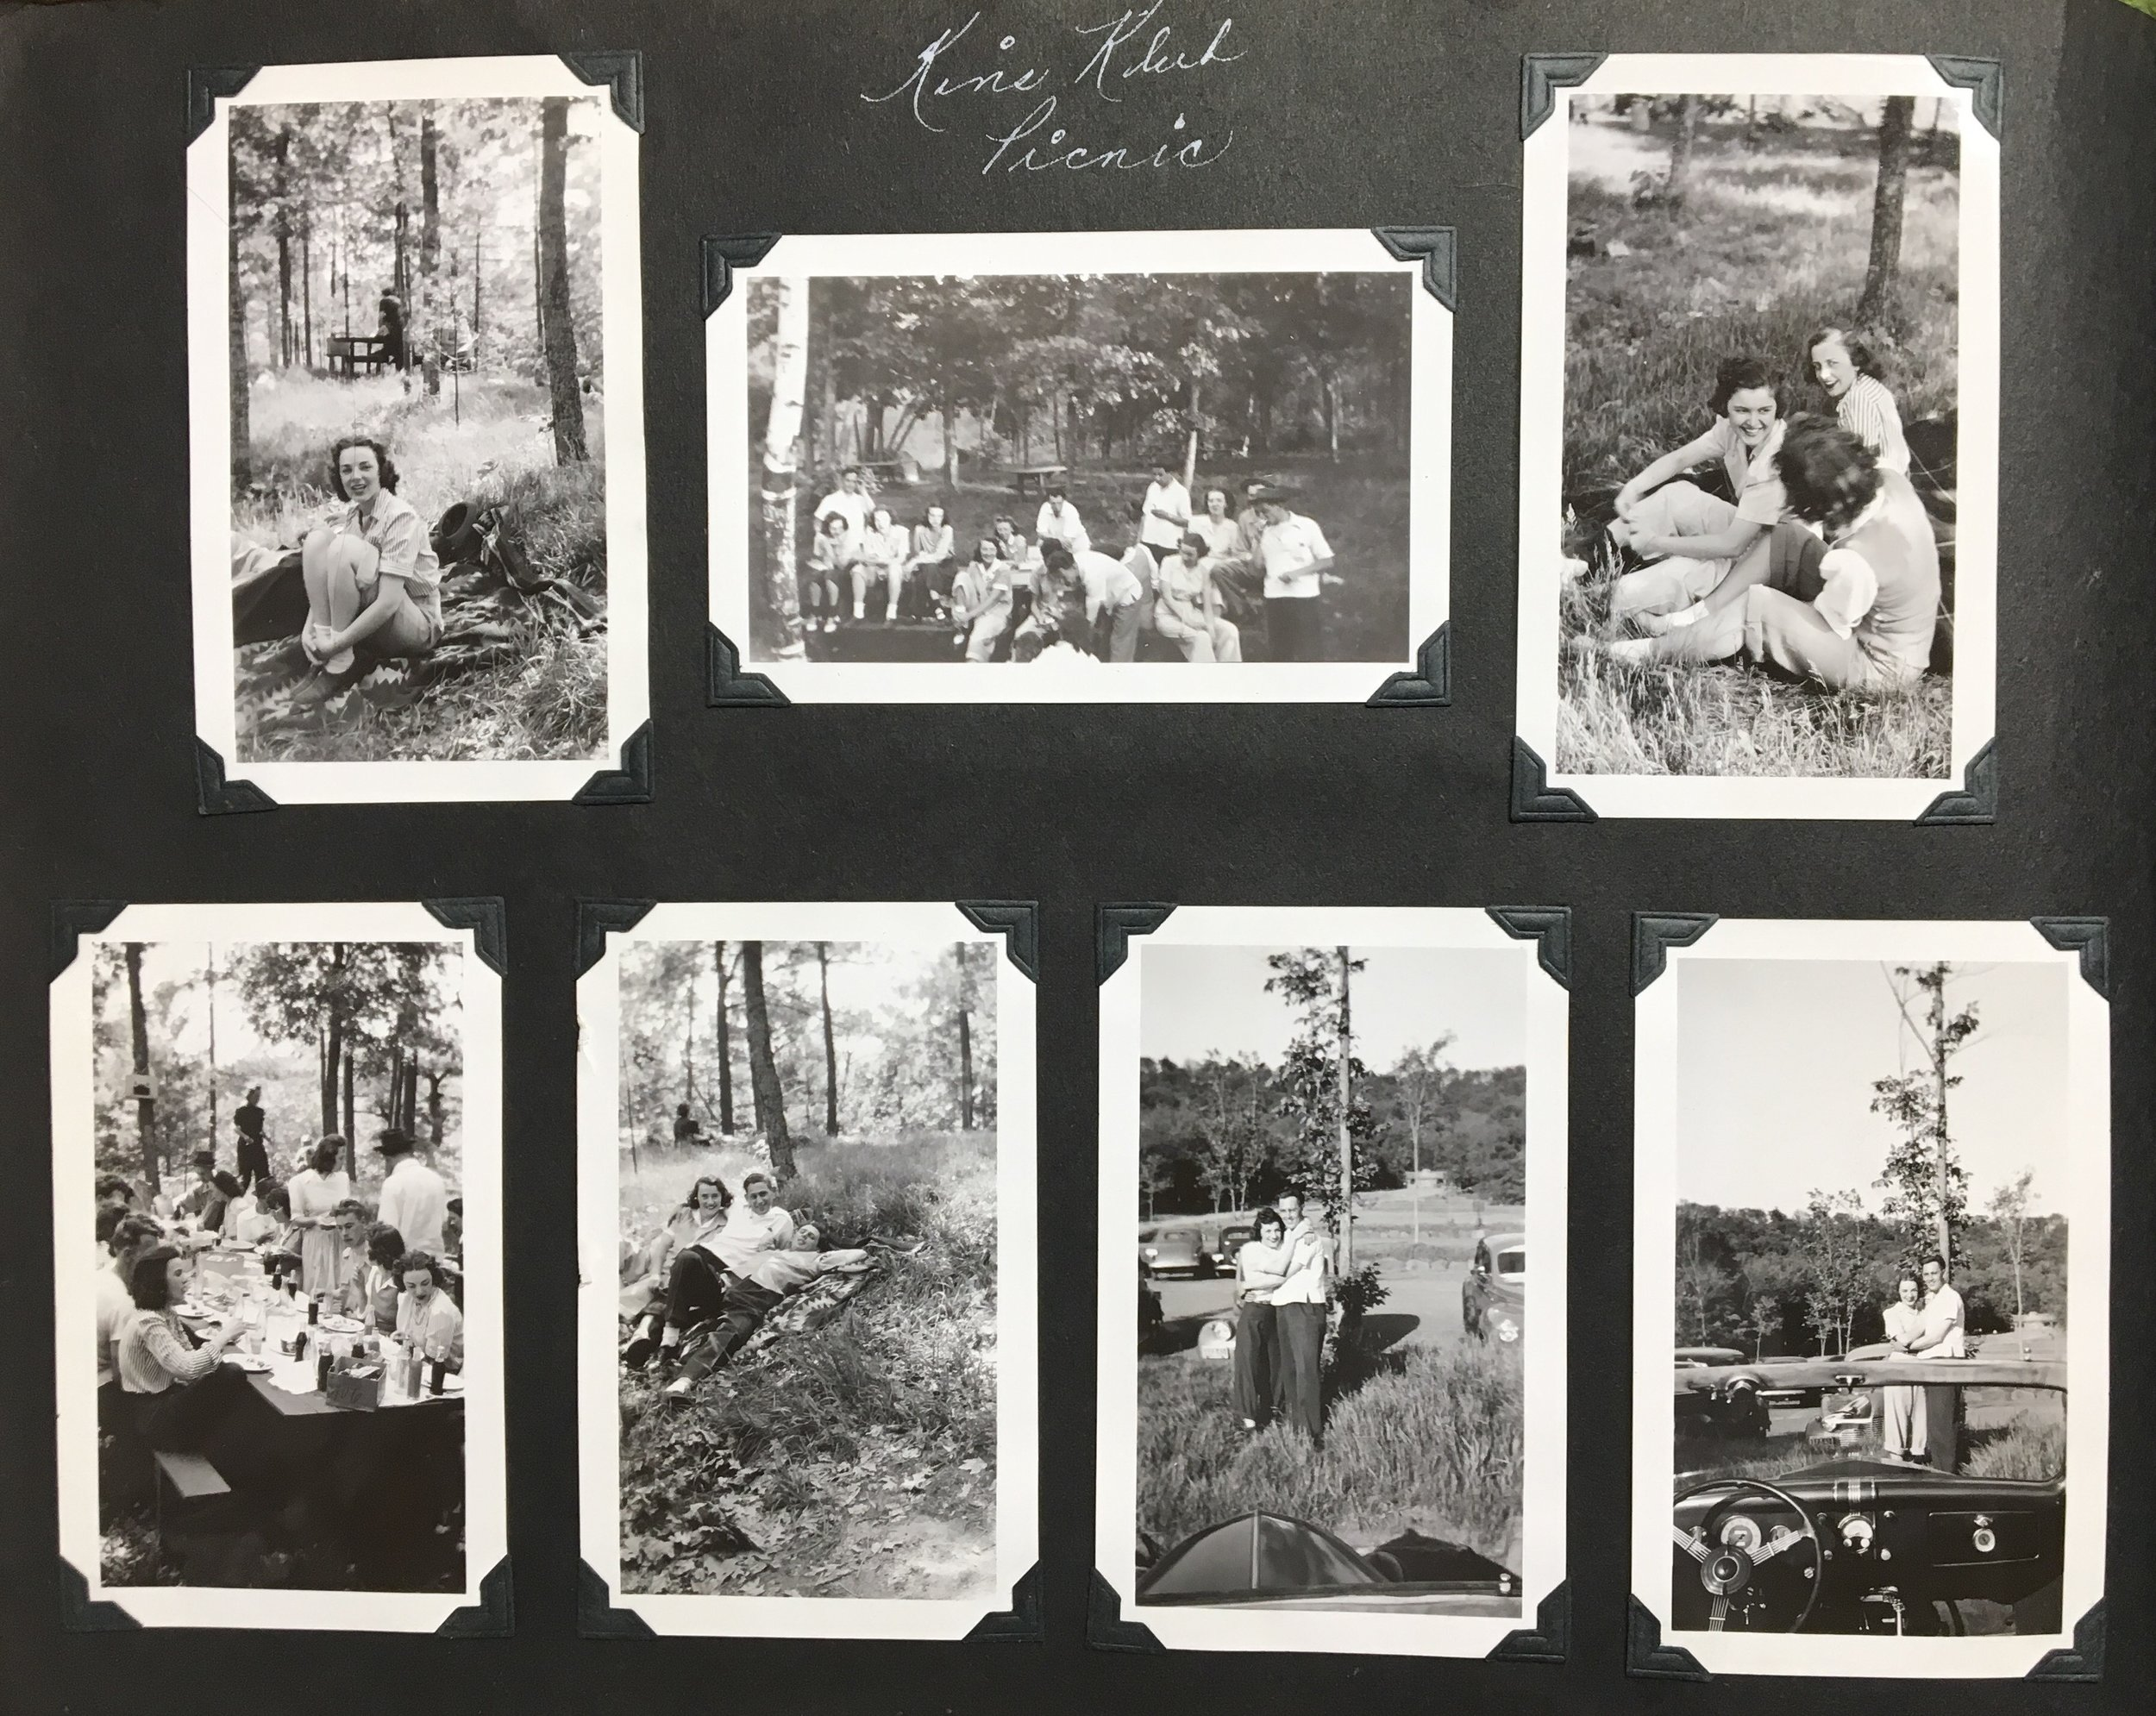 The Kins Club Picnic 1940